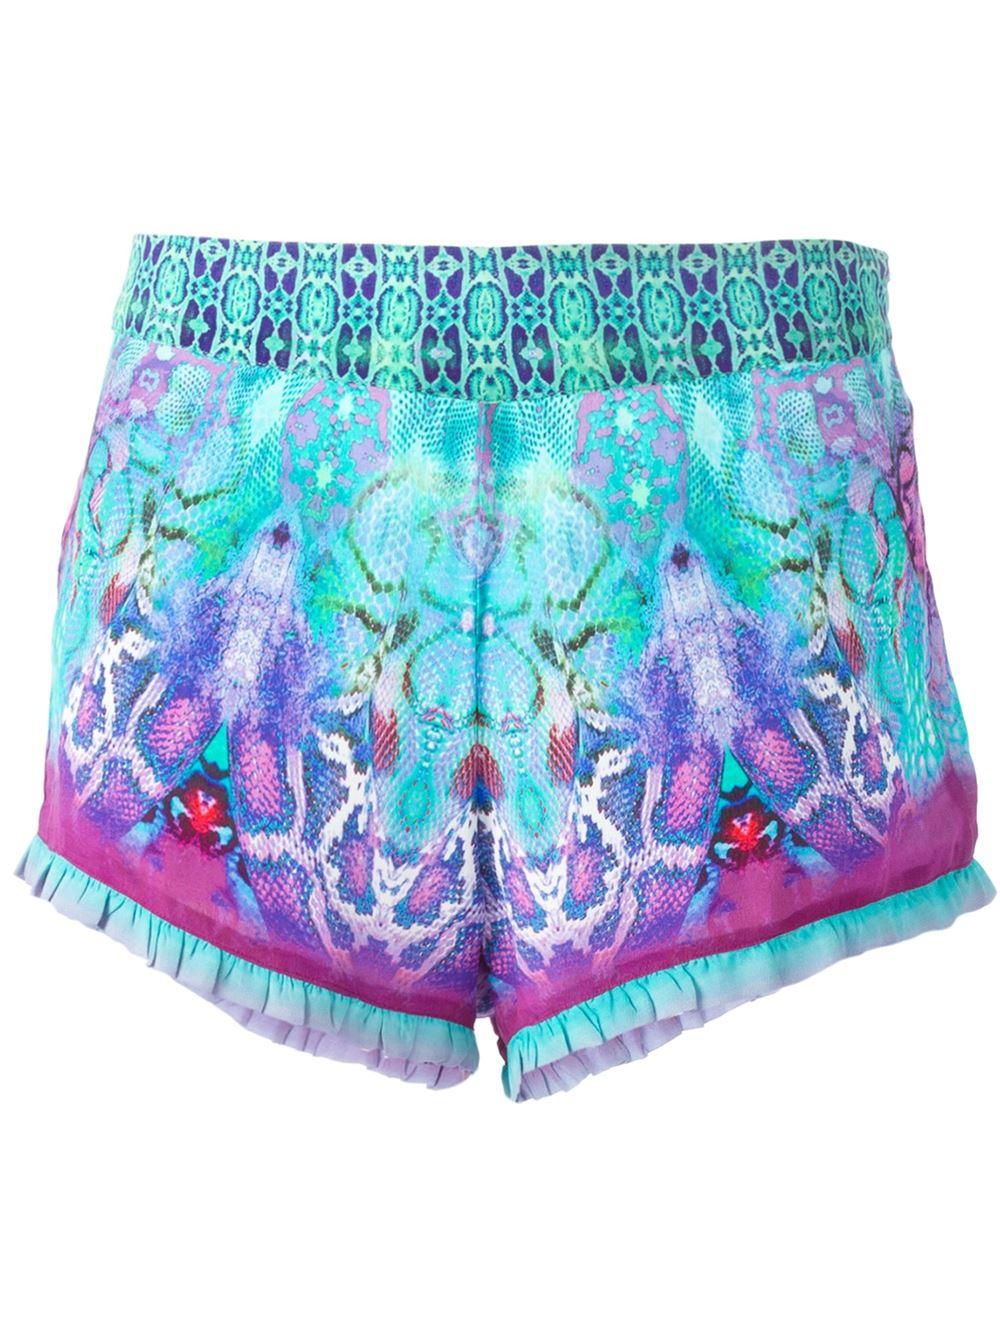 7837365333 Camilla Snakeskin Print Shorts - Lyst